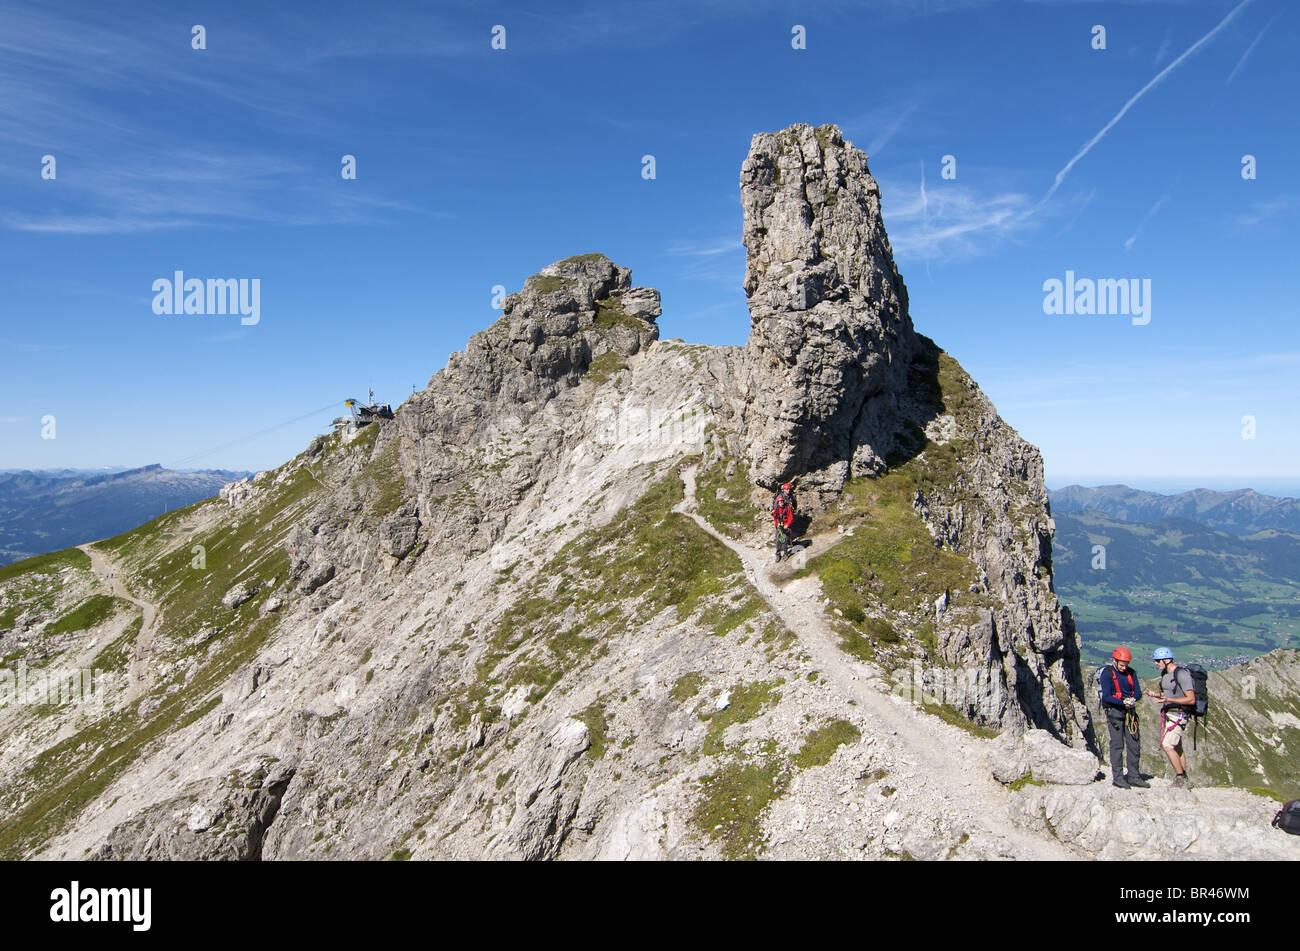 Klettersteig Hindelang : Hindelanger klettersteig großer daumen m allgäuer alpen